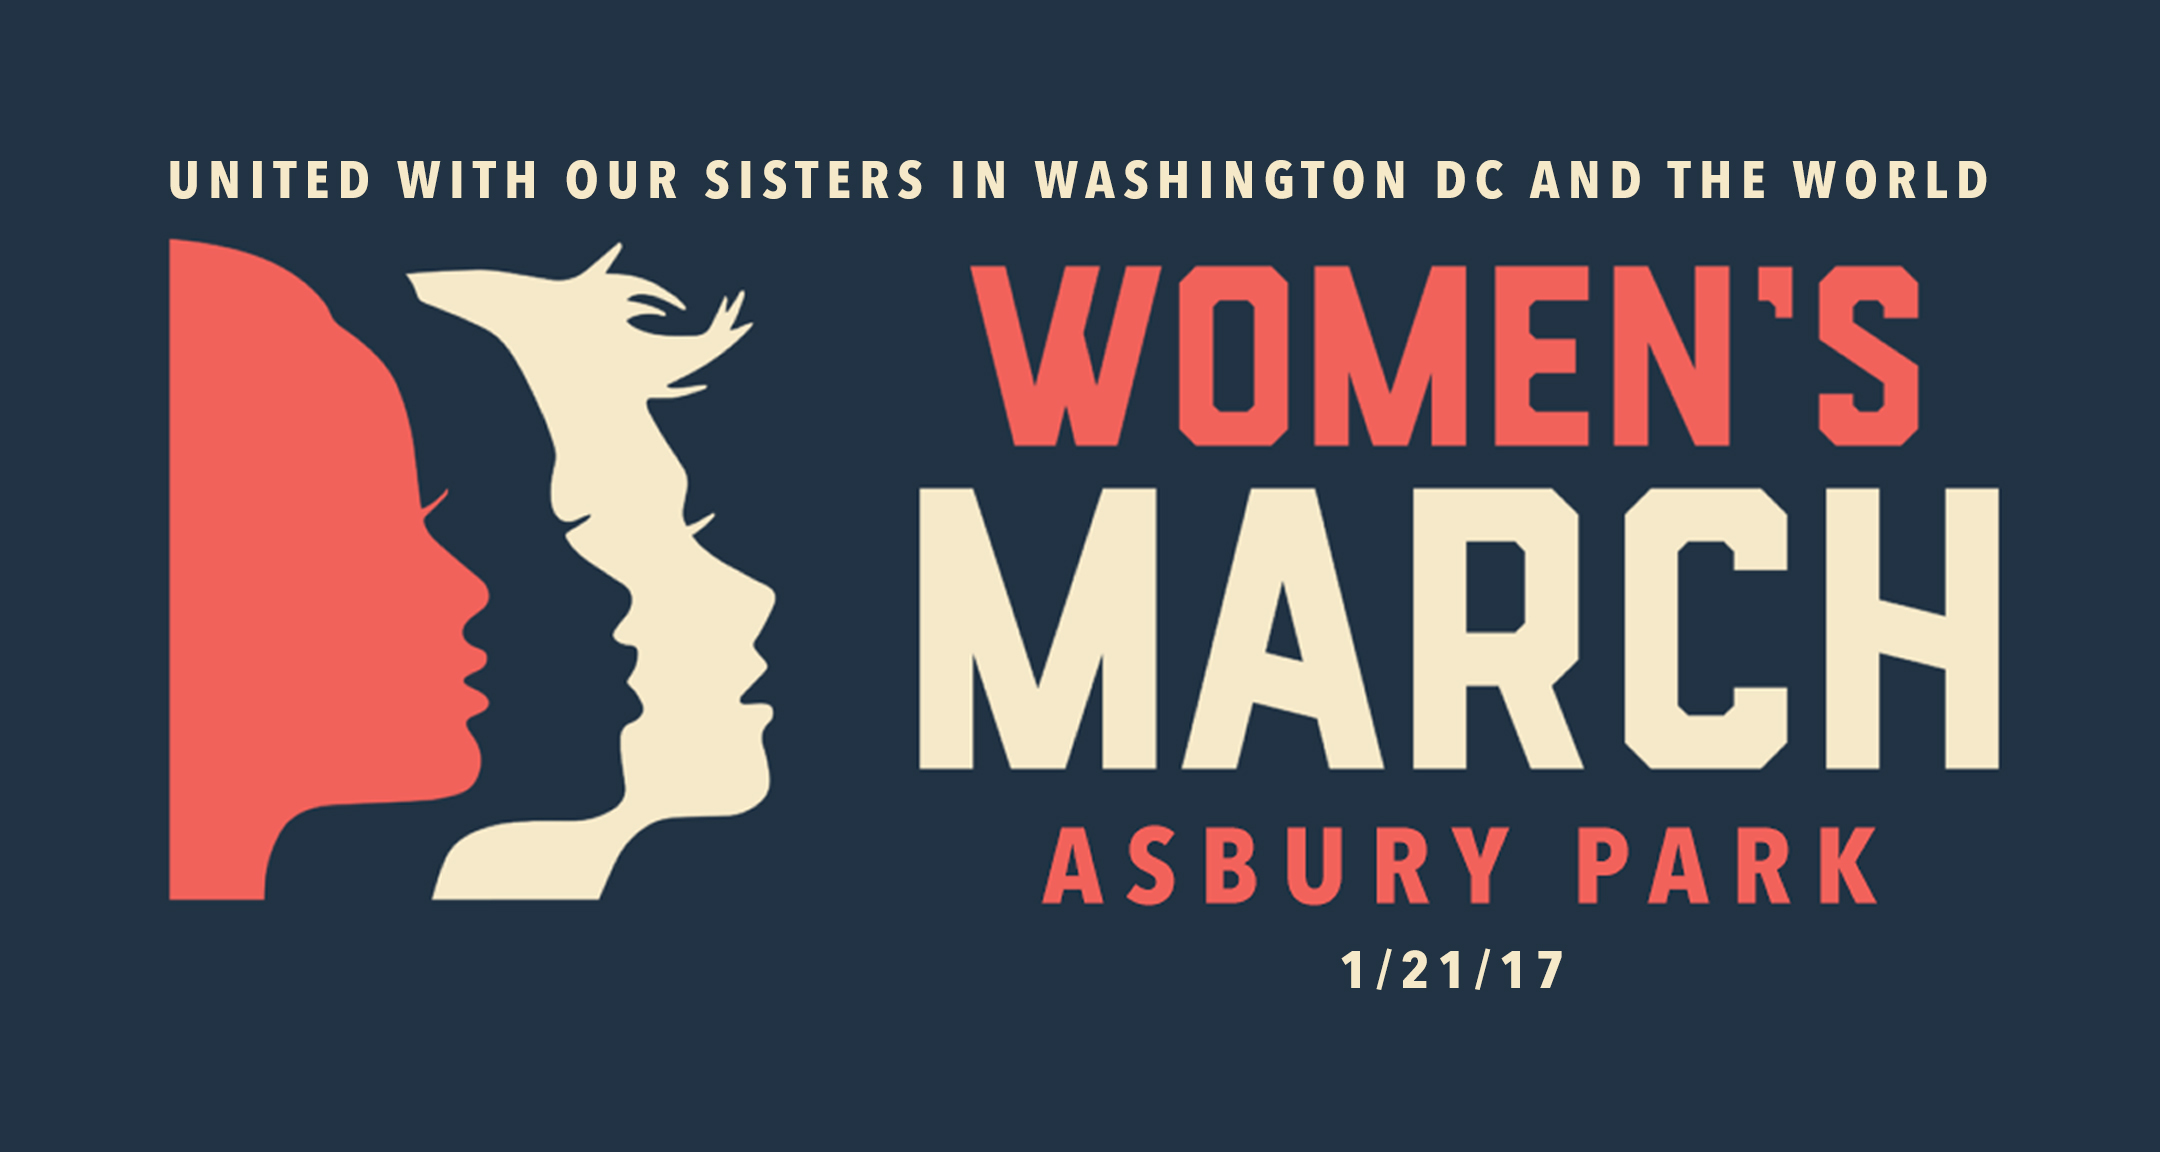 Womens_march_washington_artwork